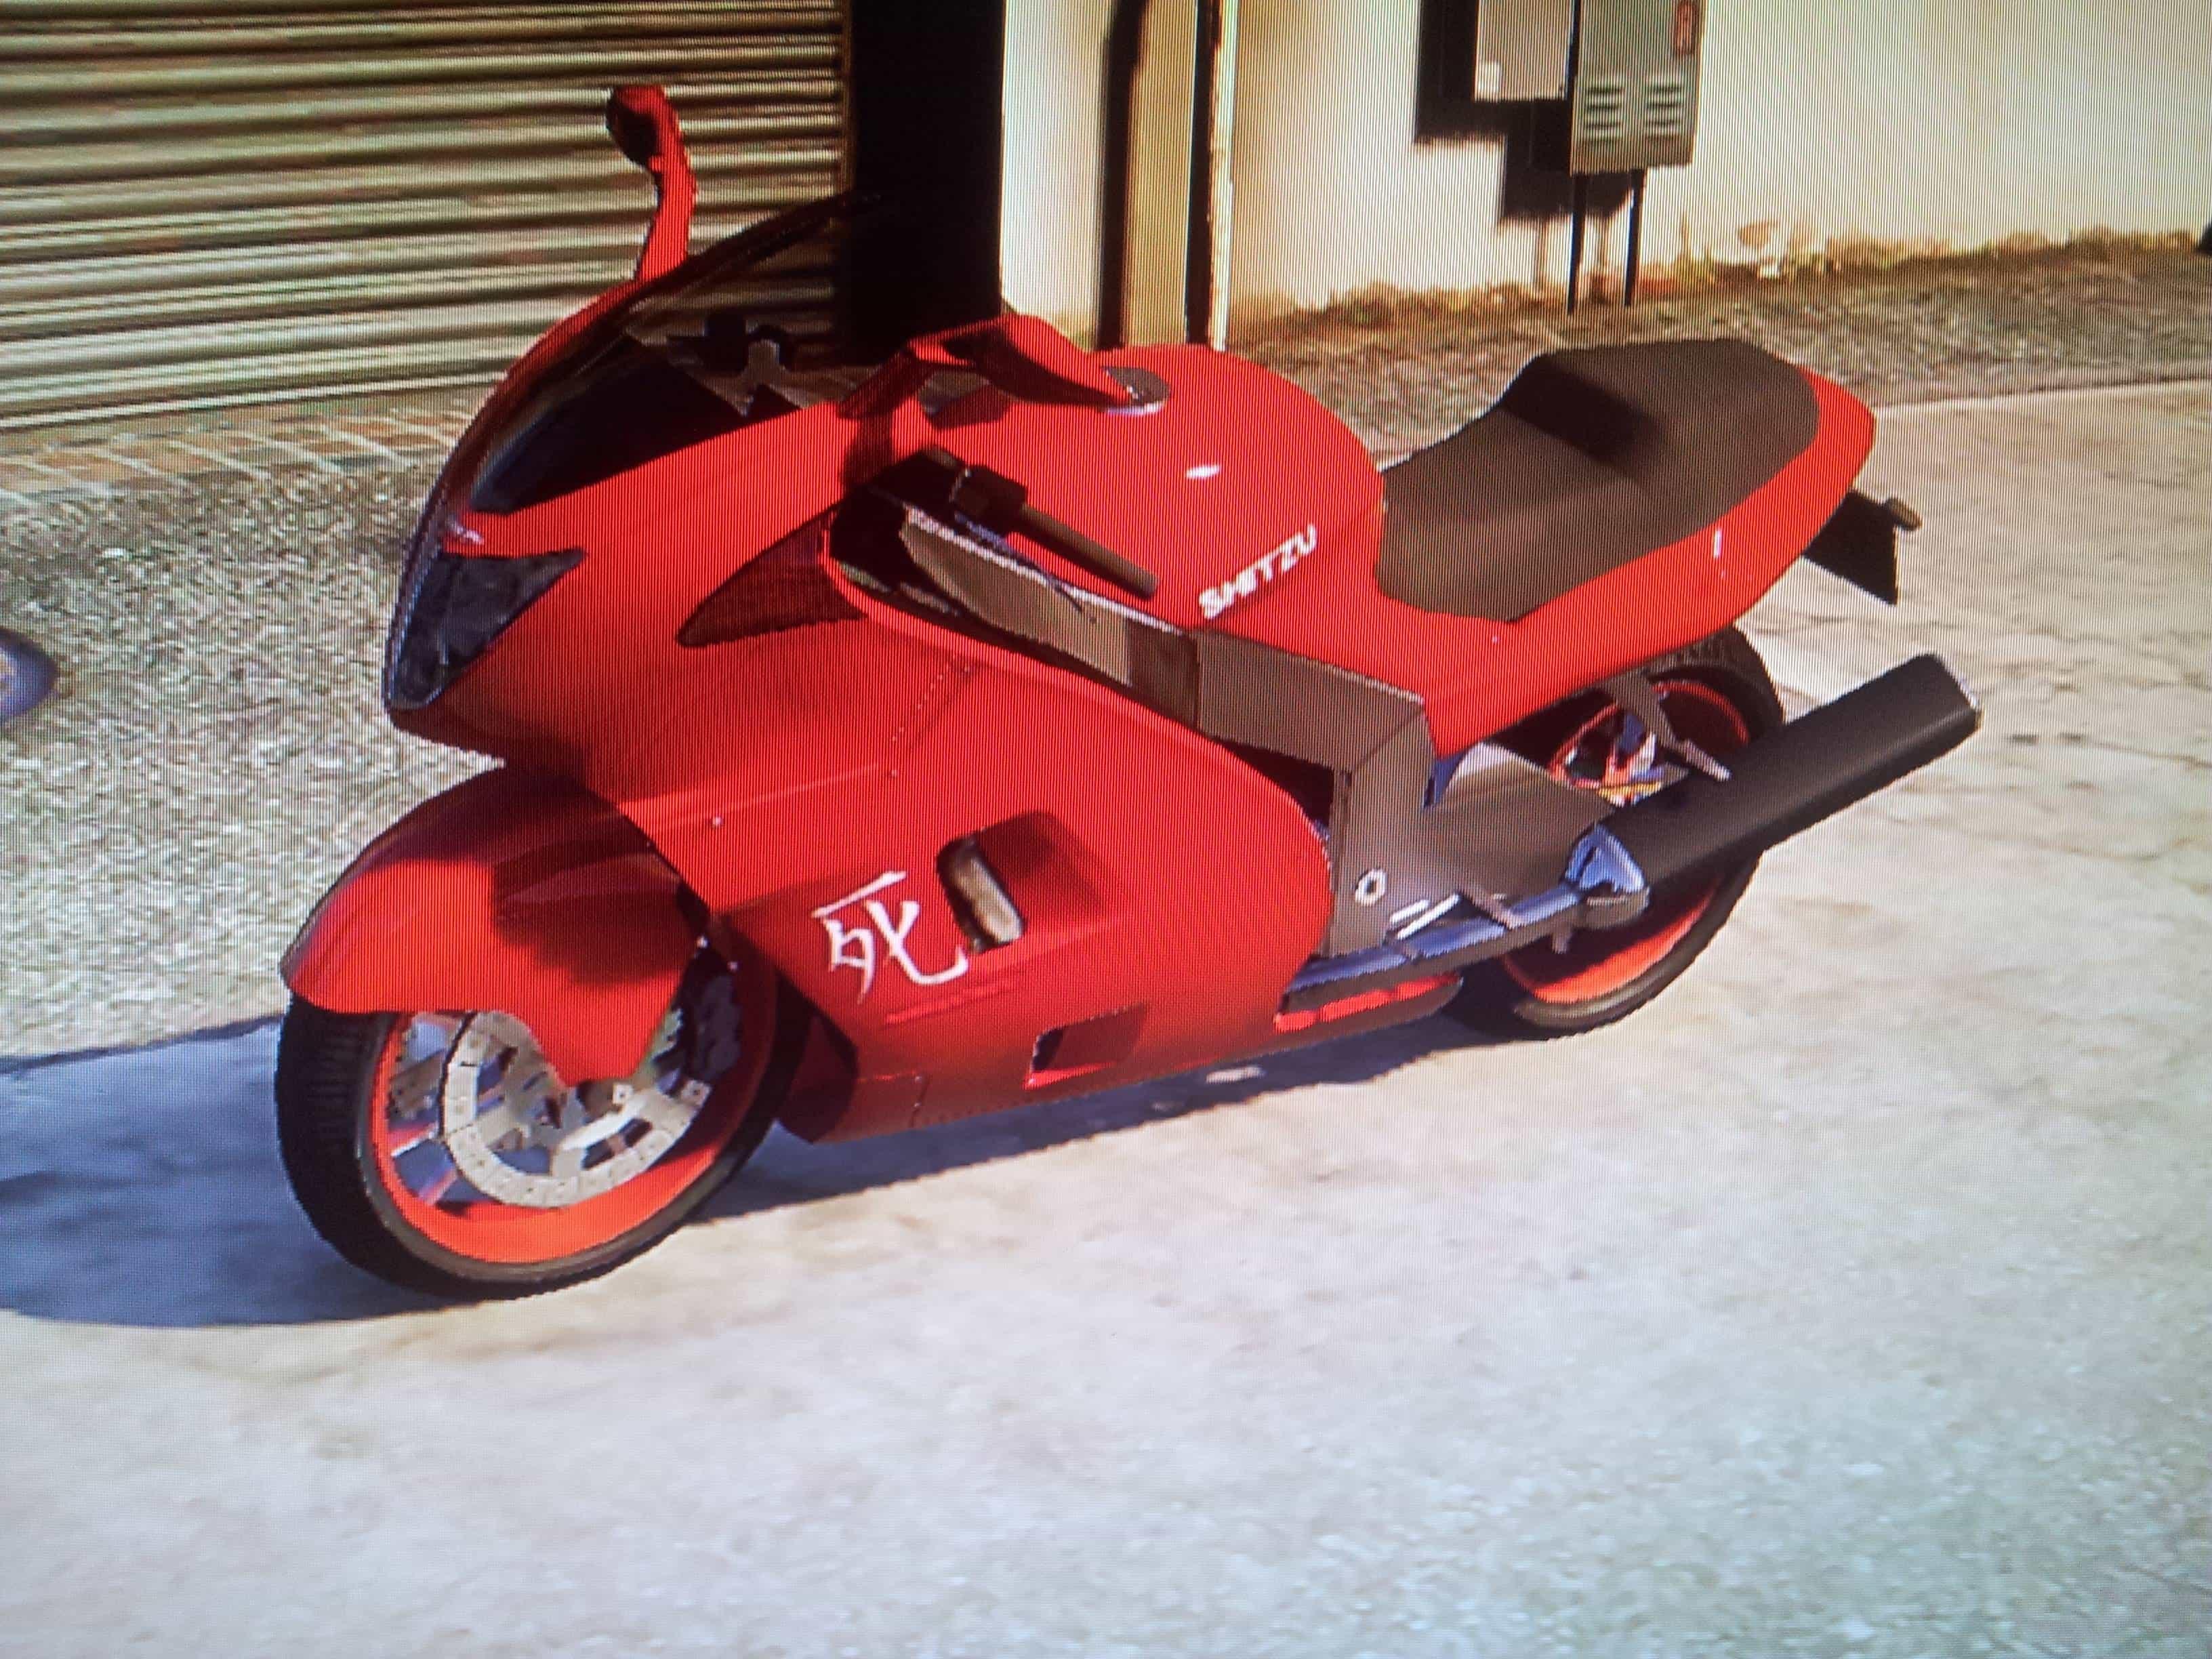 gta 5 online how to create motorcycle club